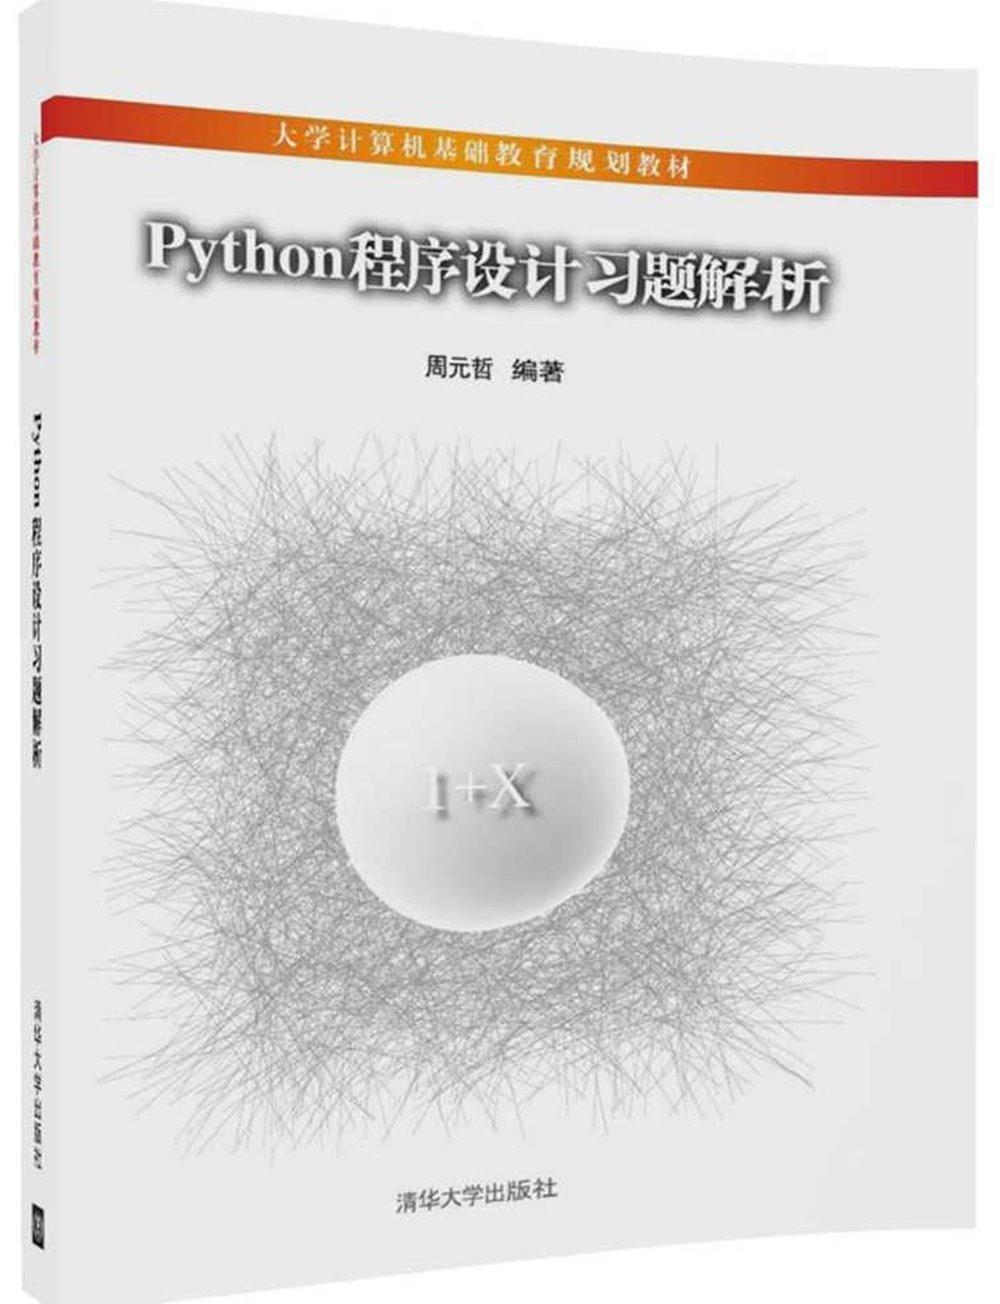 Python程序 習題解析